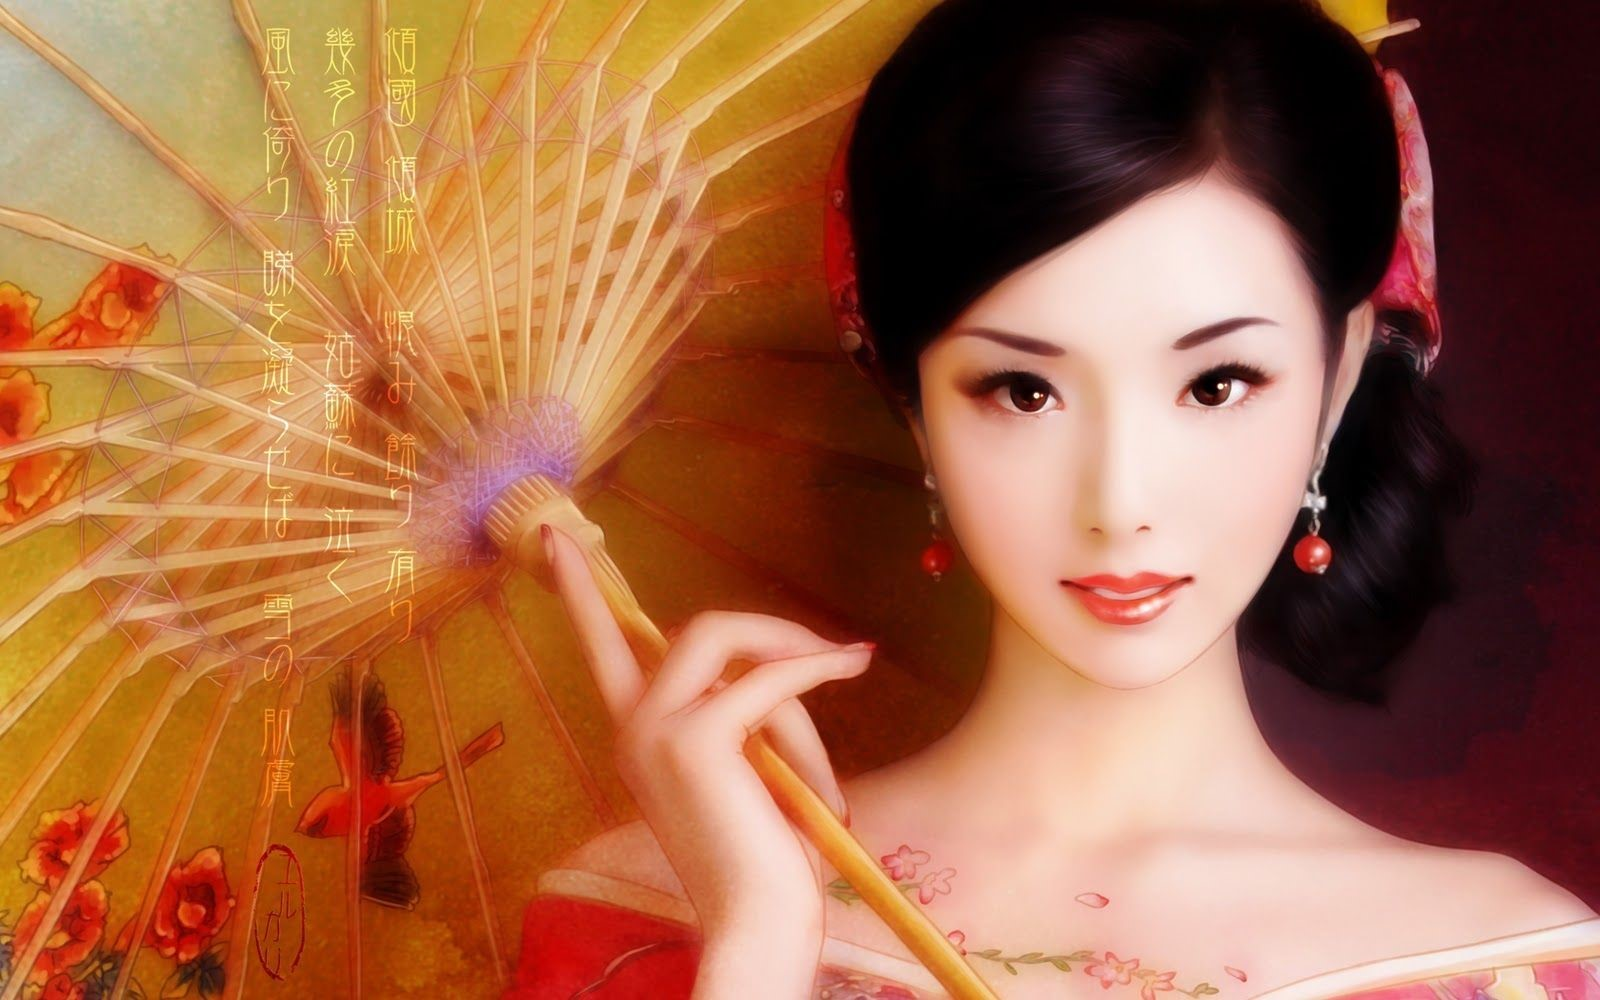 Japanese Geisha Girls Art Mobile Wallpapers